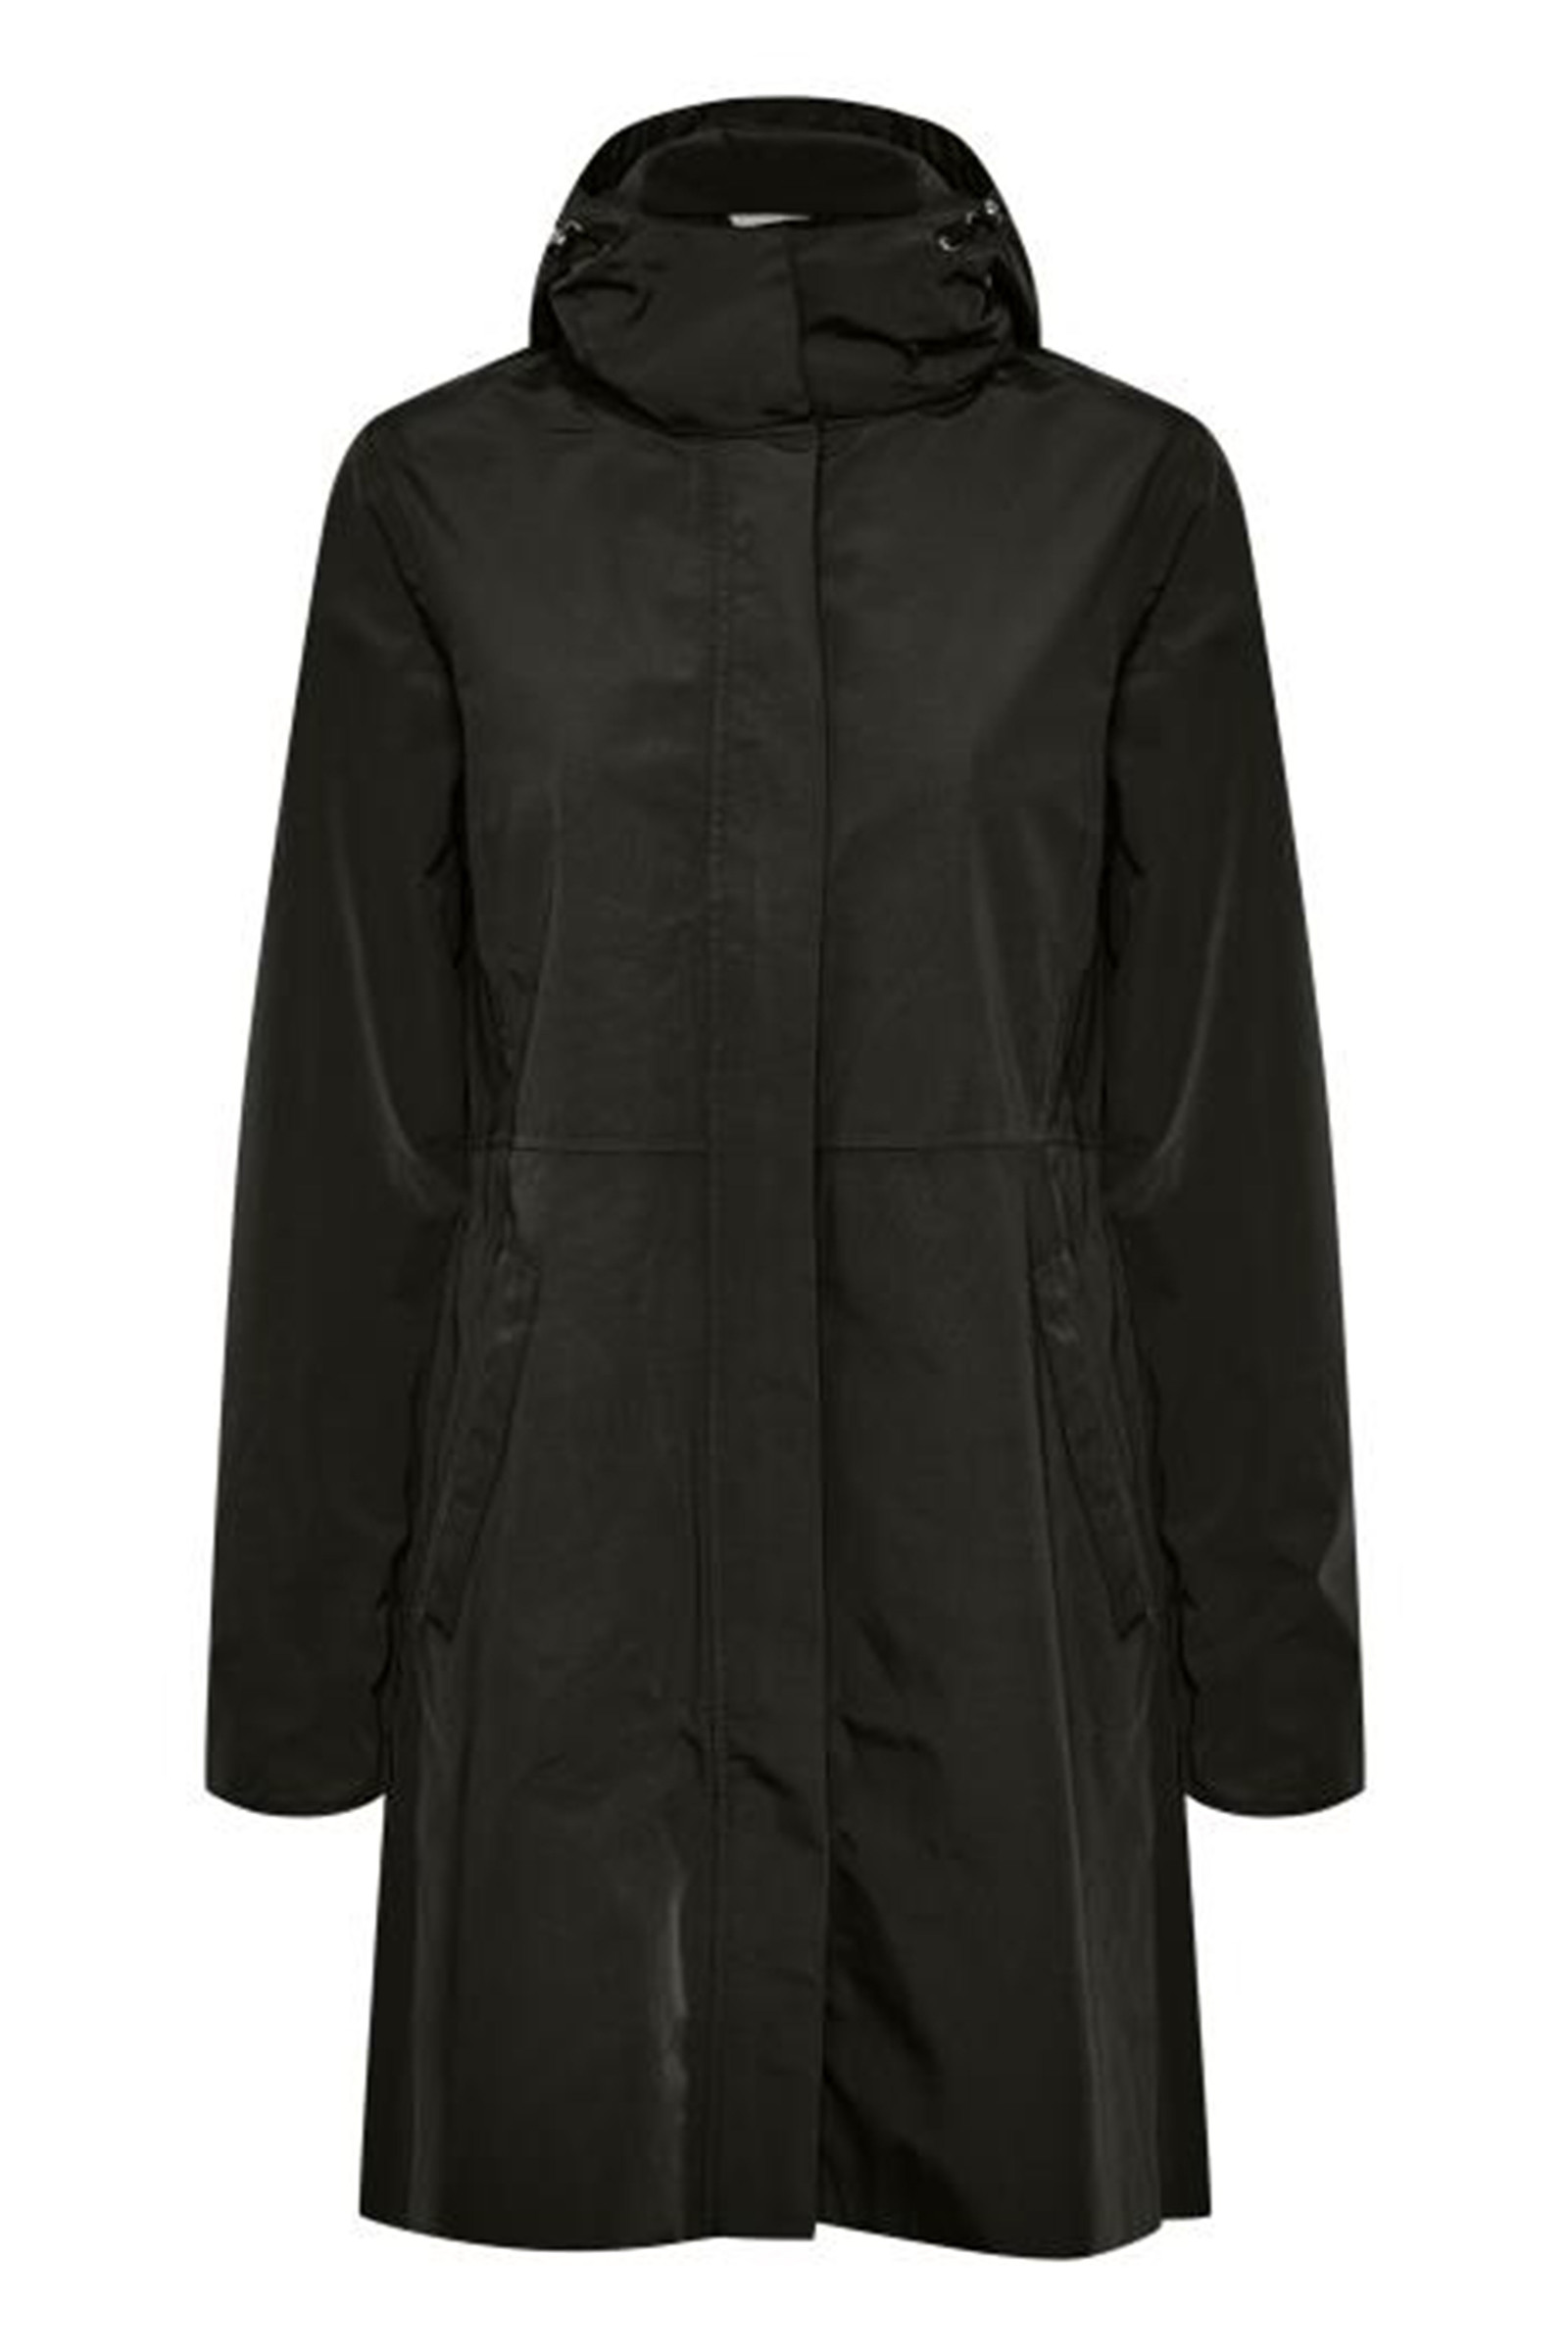 PART TWO BeaPW Rainwear 30304826 Black